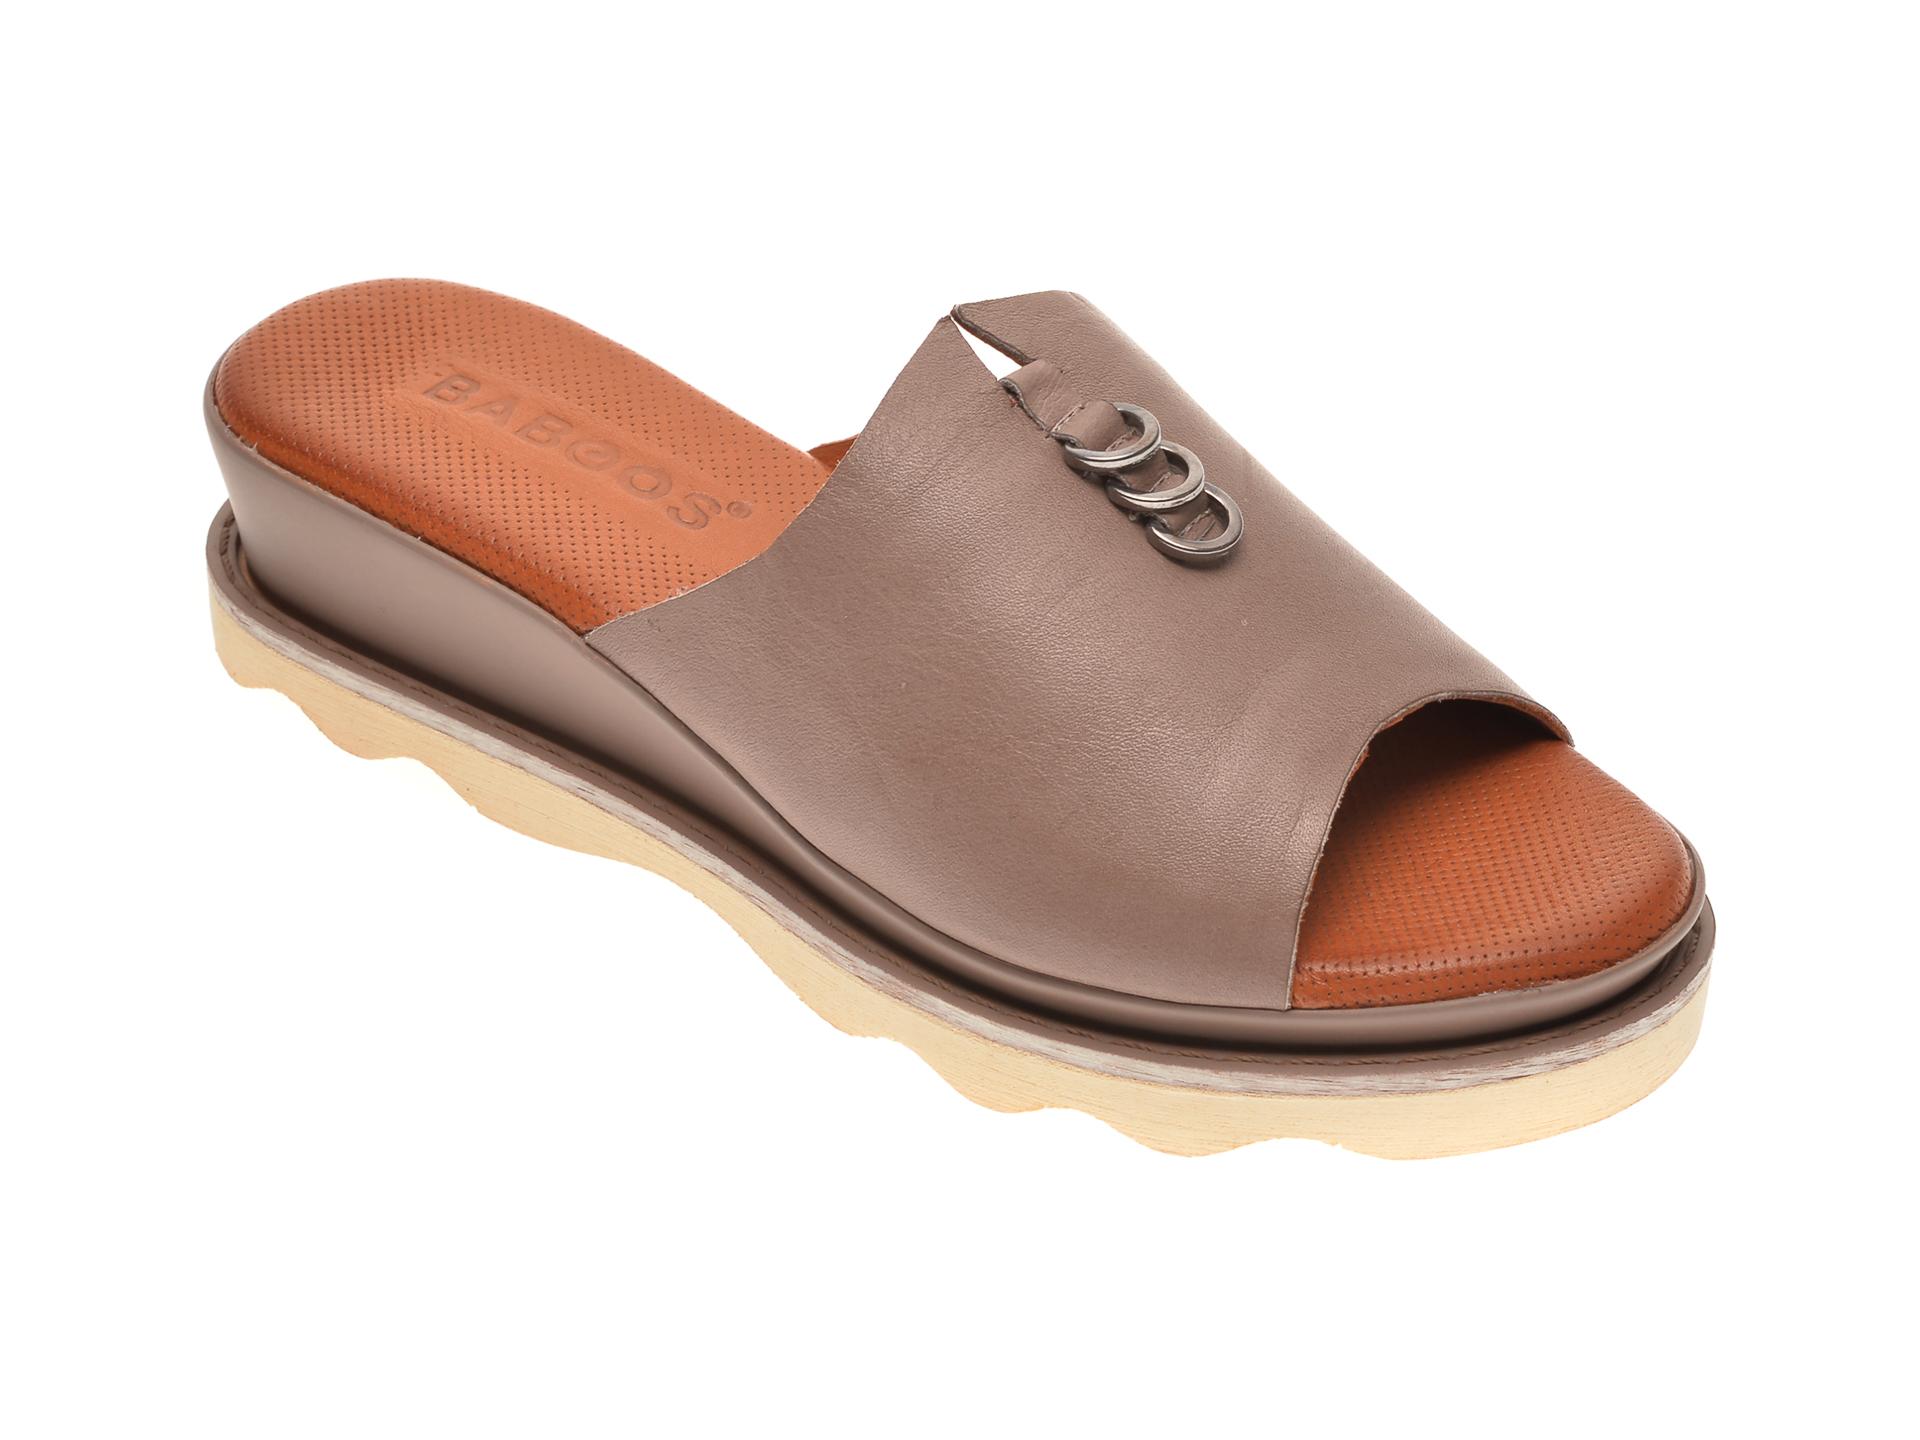 Papuci BABOOS gri, 0207, din piele naturala imagine